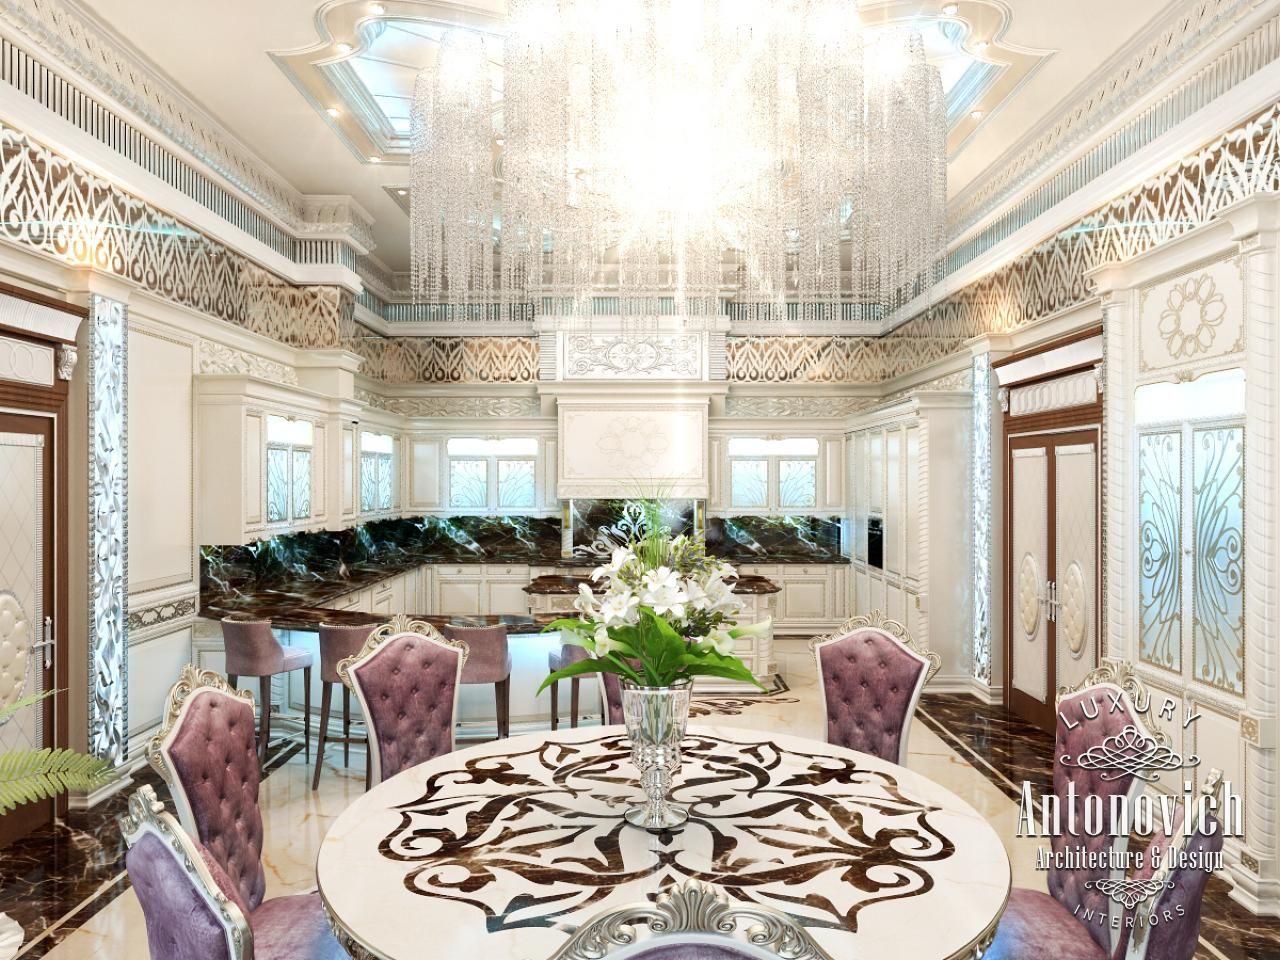 Kitchens dubai from antonovich design - Kitchen Design In Dubai Luxury Kitchen Abu Dhabi Photo 1